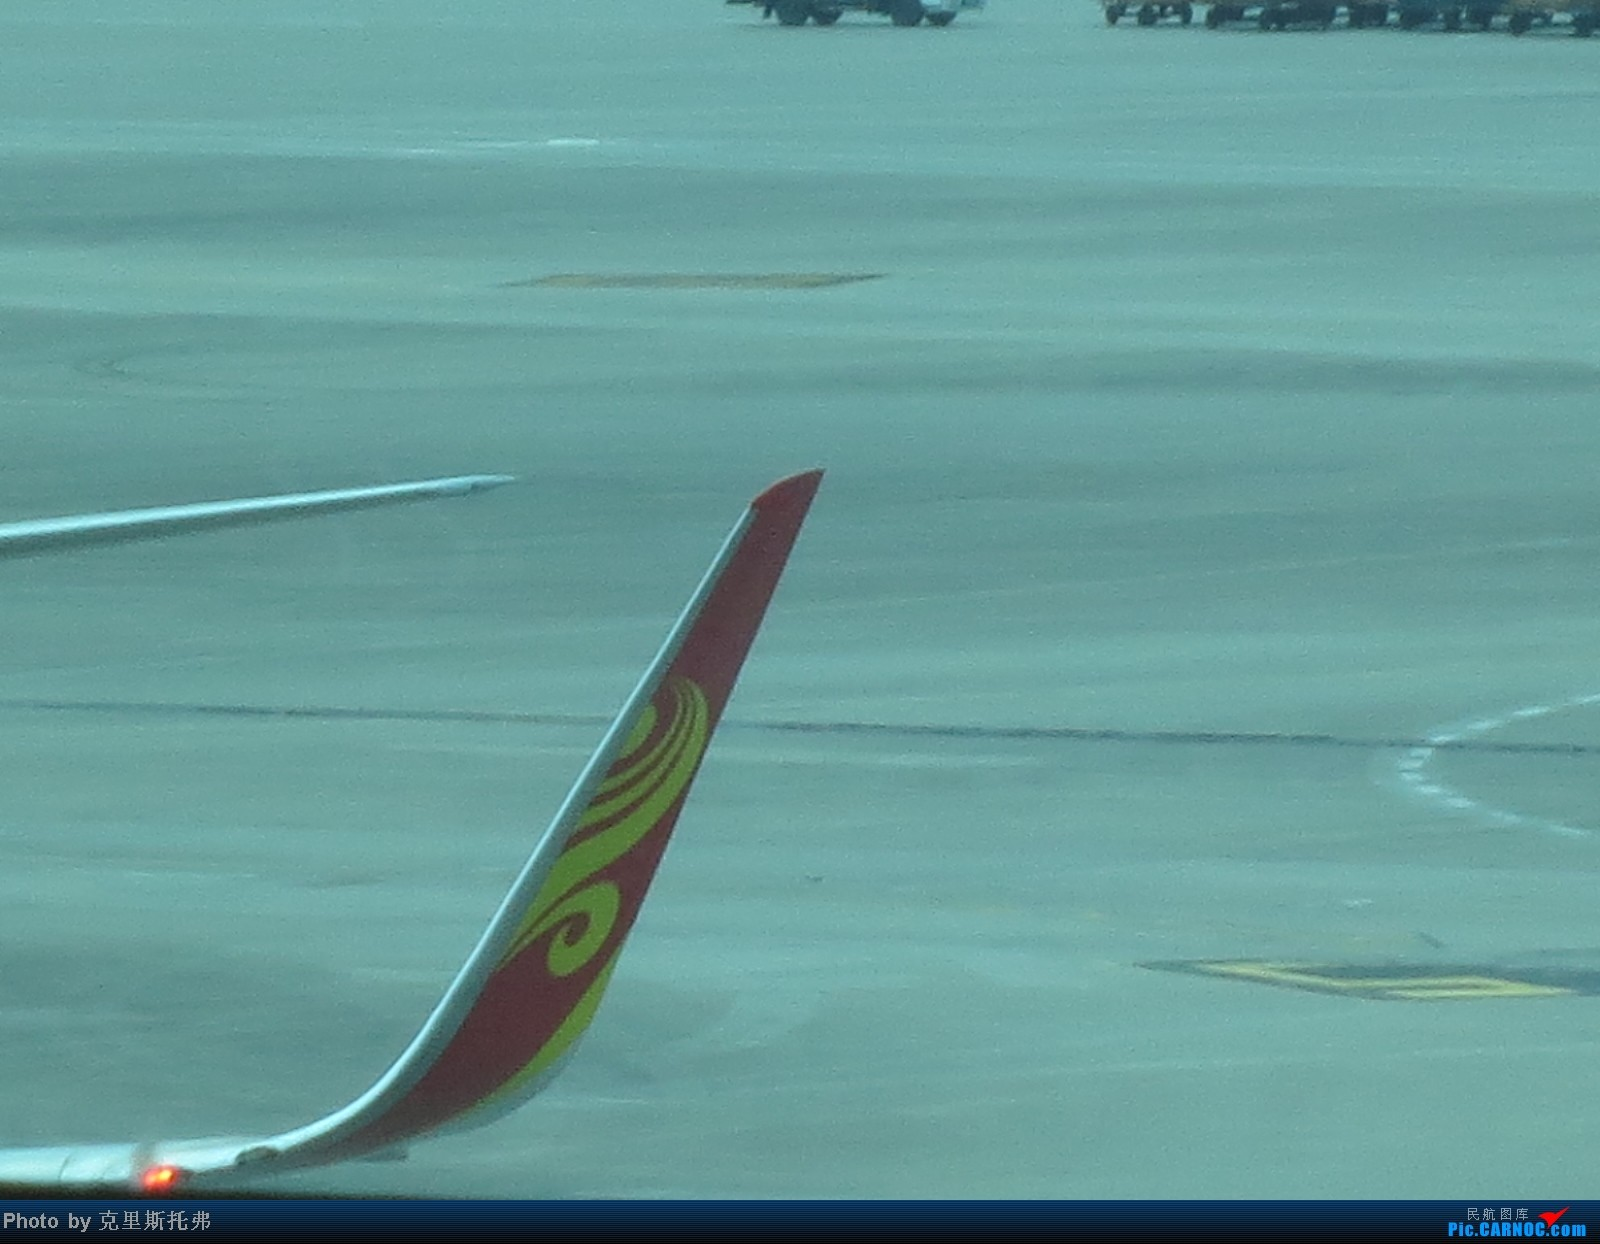 Re:[原创]【广州,你好!】八月齐鲁行 第一集 {初到齐鲁城} 不期而遇,鹏程行万里 相伴相惜,享飞行至美 737